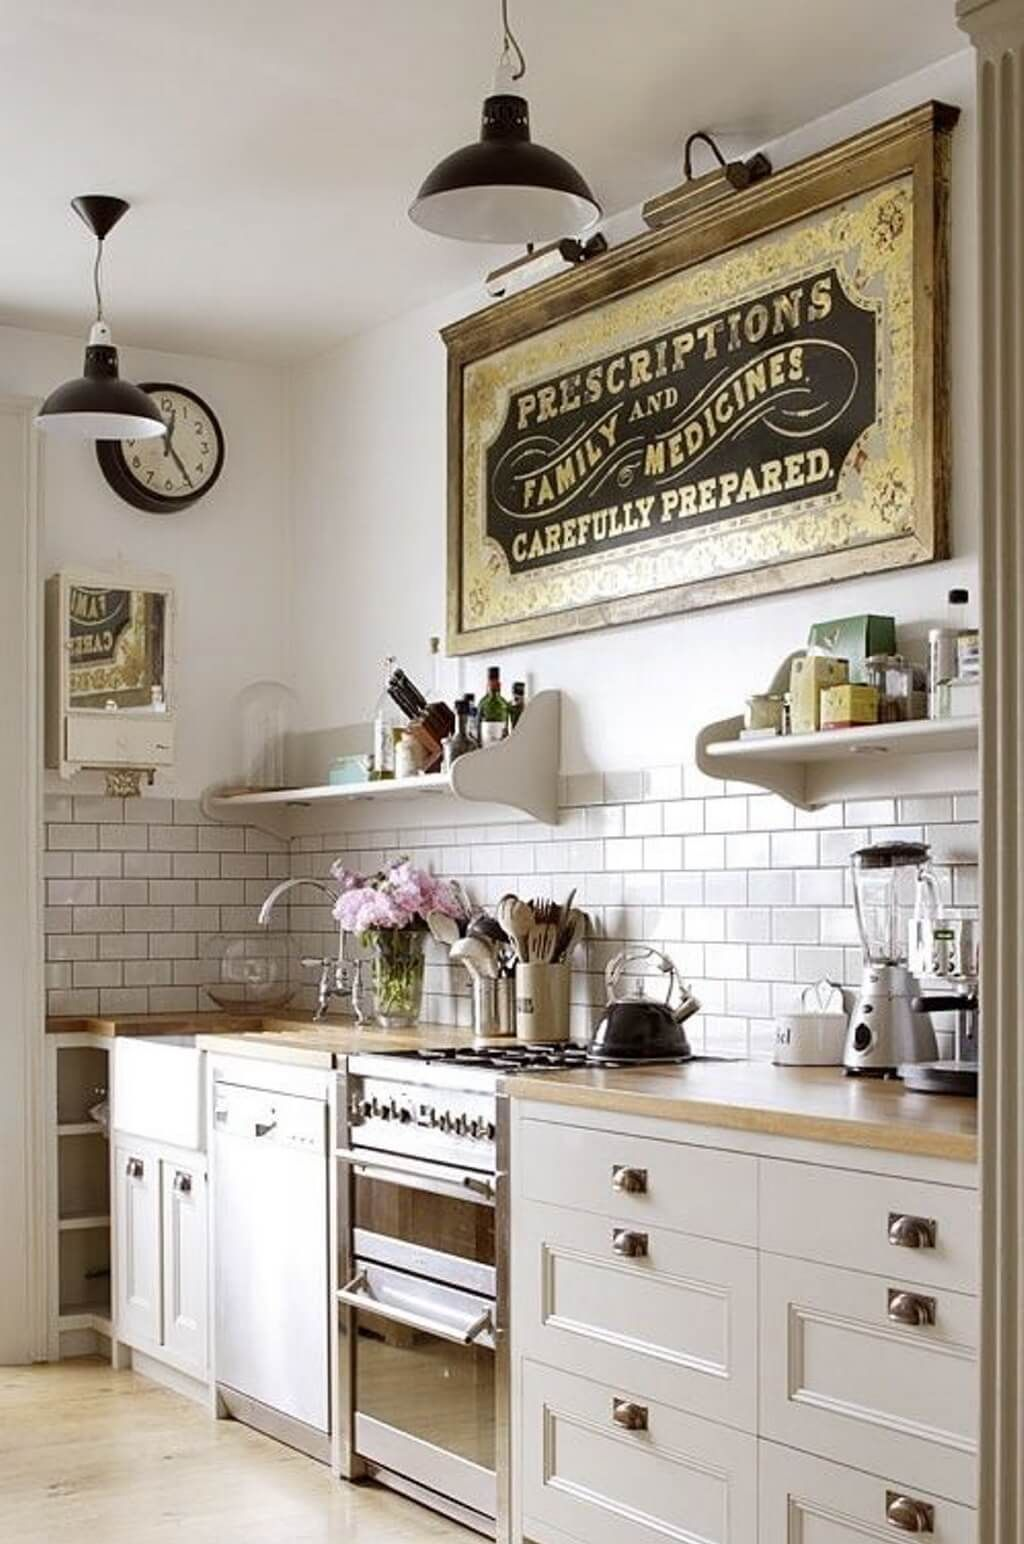 quando lo stile vintage entra in cucina! 20 idee bellissime